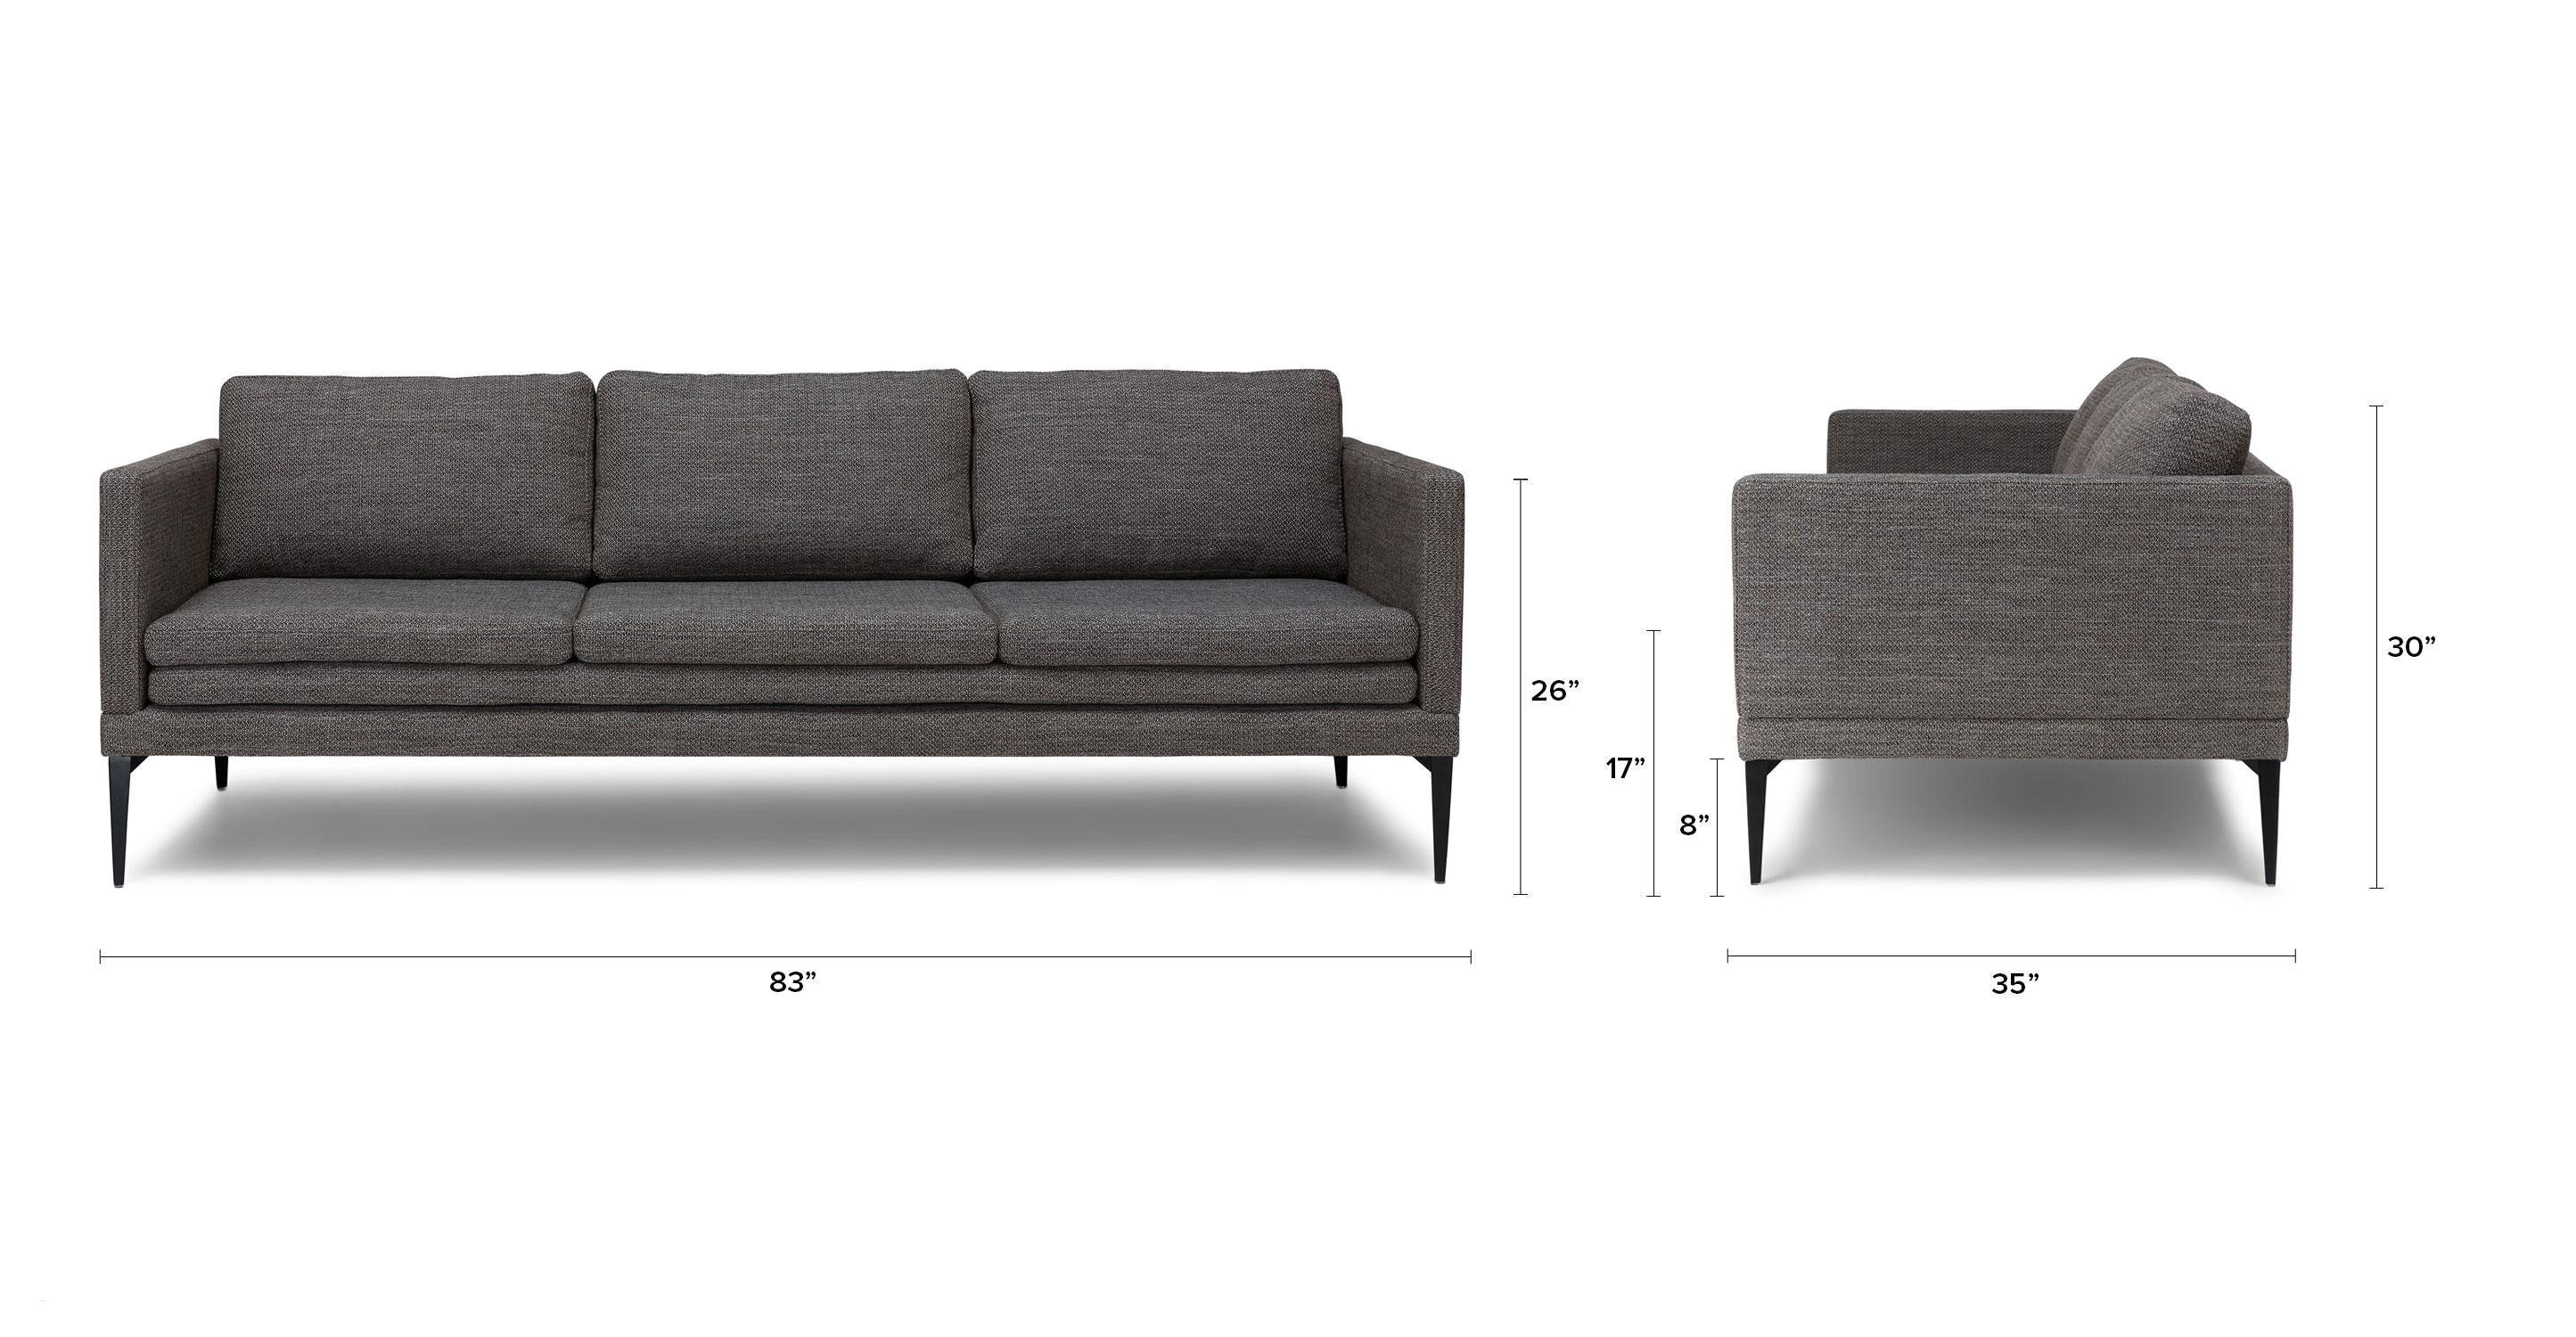 black patio furniture fresh furniture wicker loveseat elegant wicker outdoor sofa 0d patio black patio